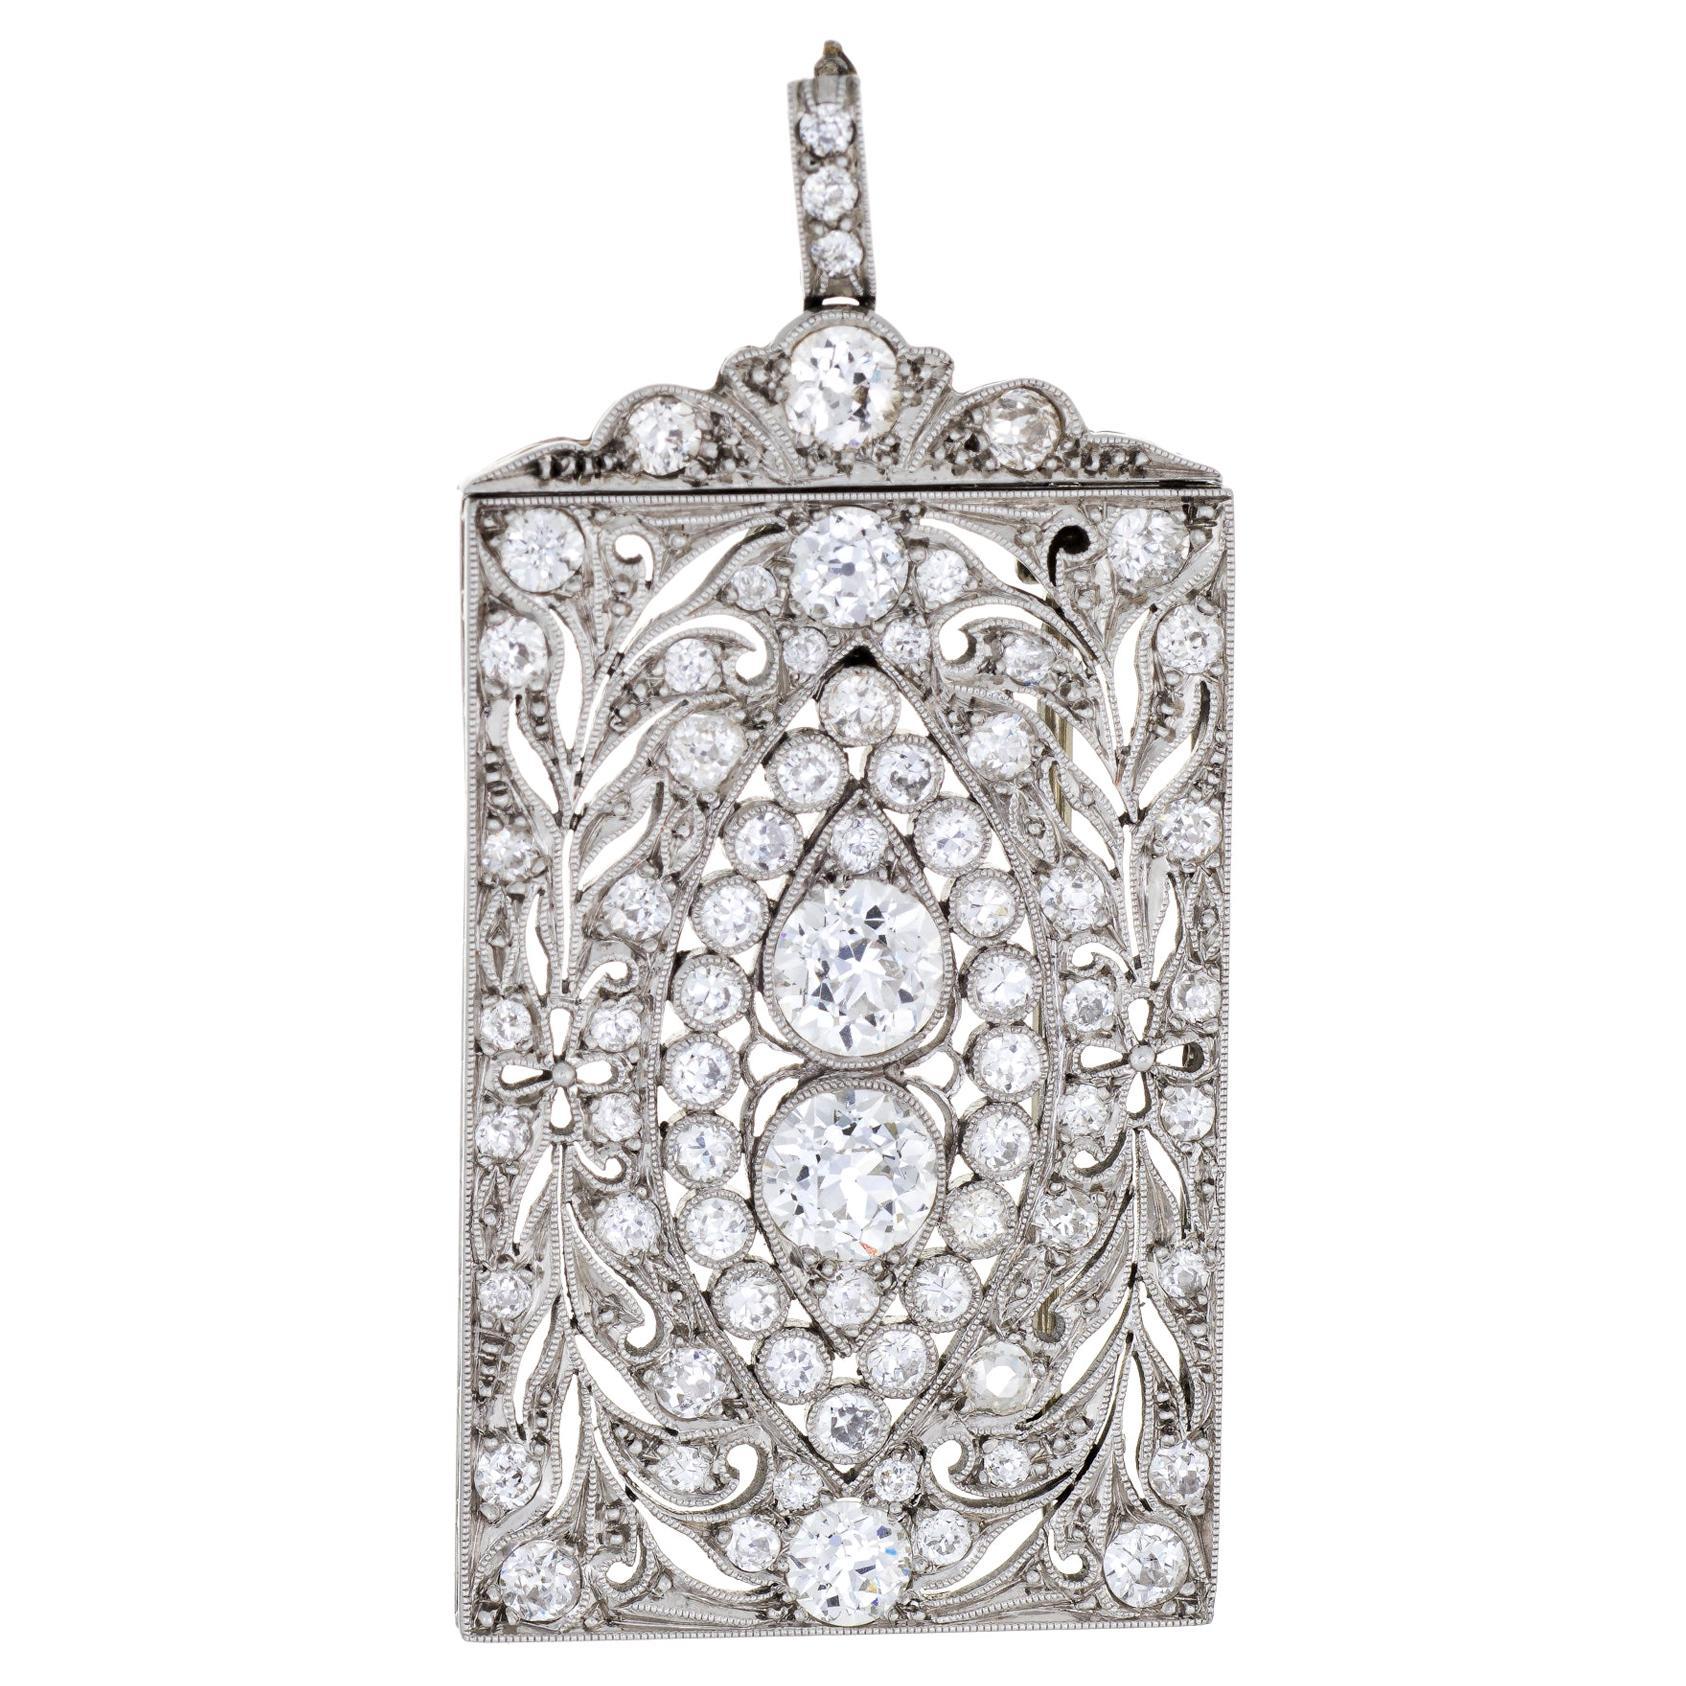 Antique Edwardian 3 Carat Diamond Pendant Brooch Platinum Vintage Fine Jewelry